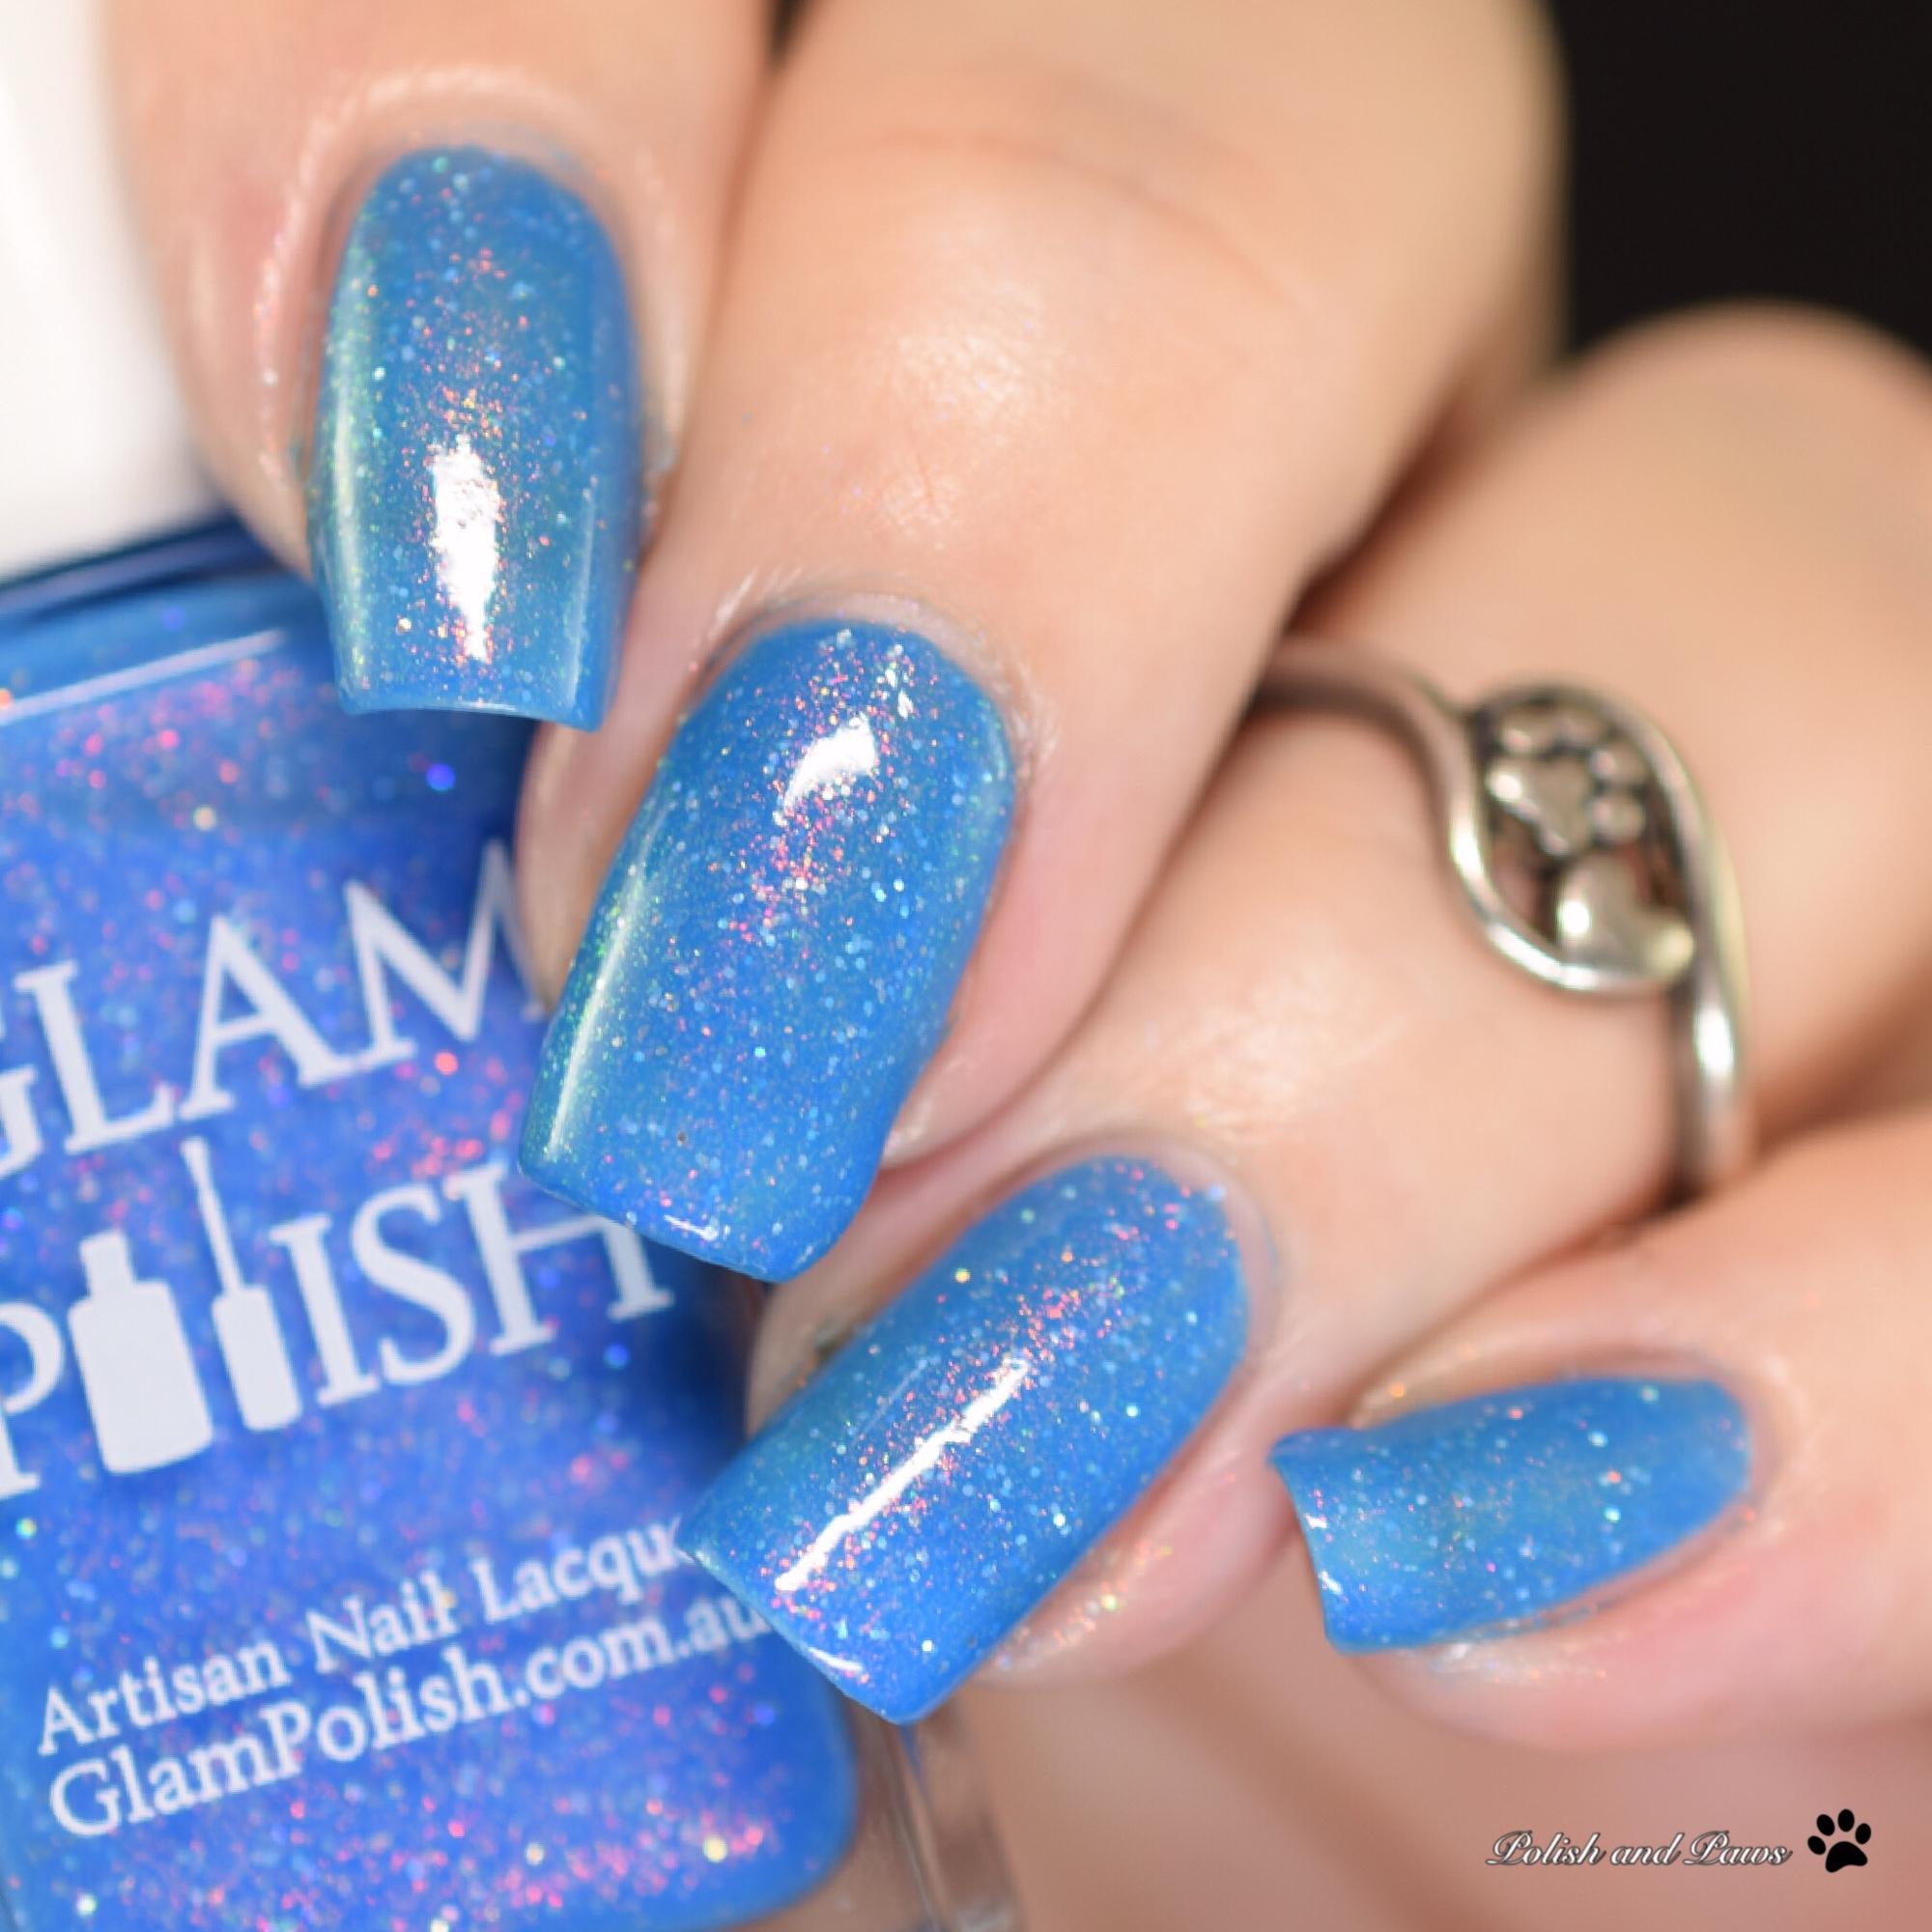 Glam Polish Shattered Empire